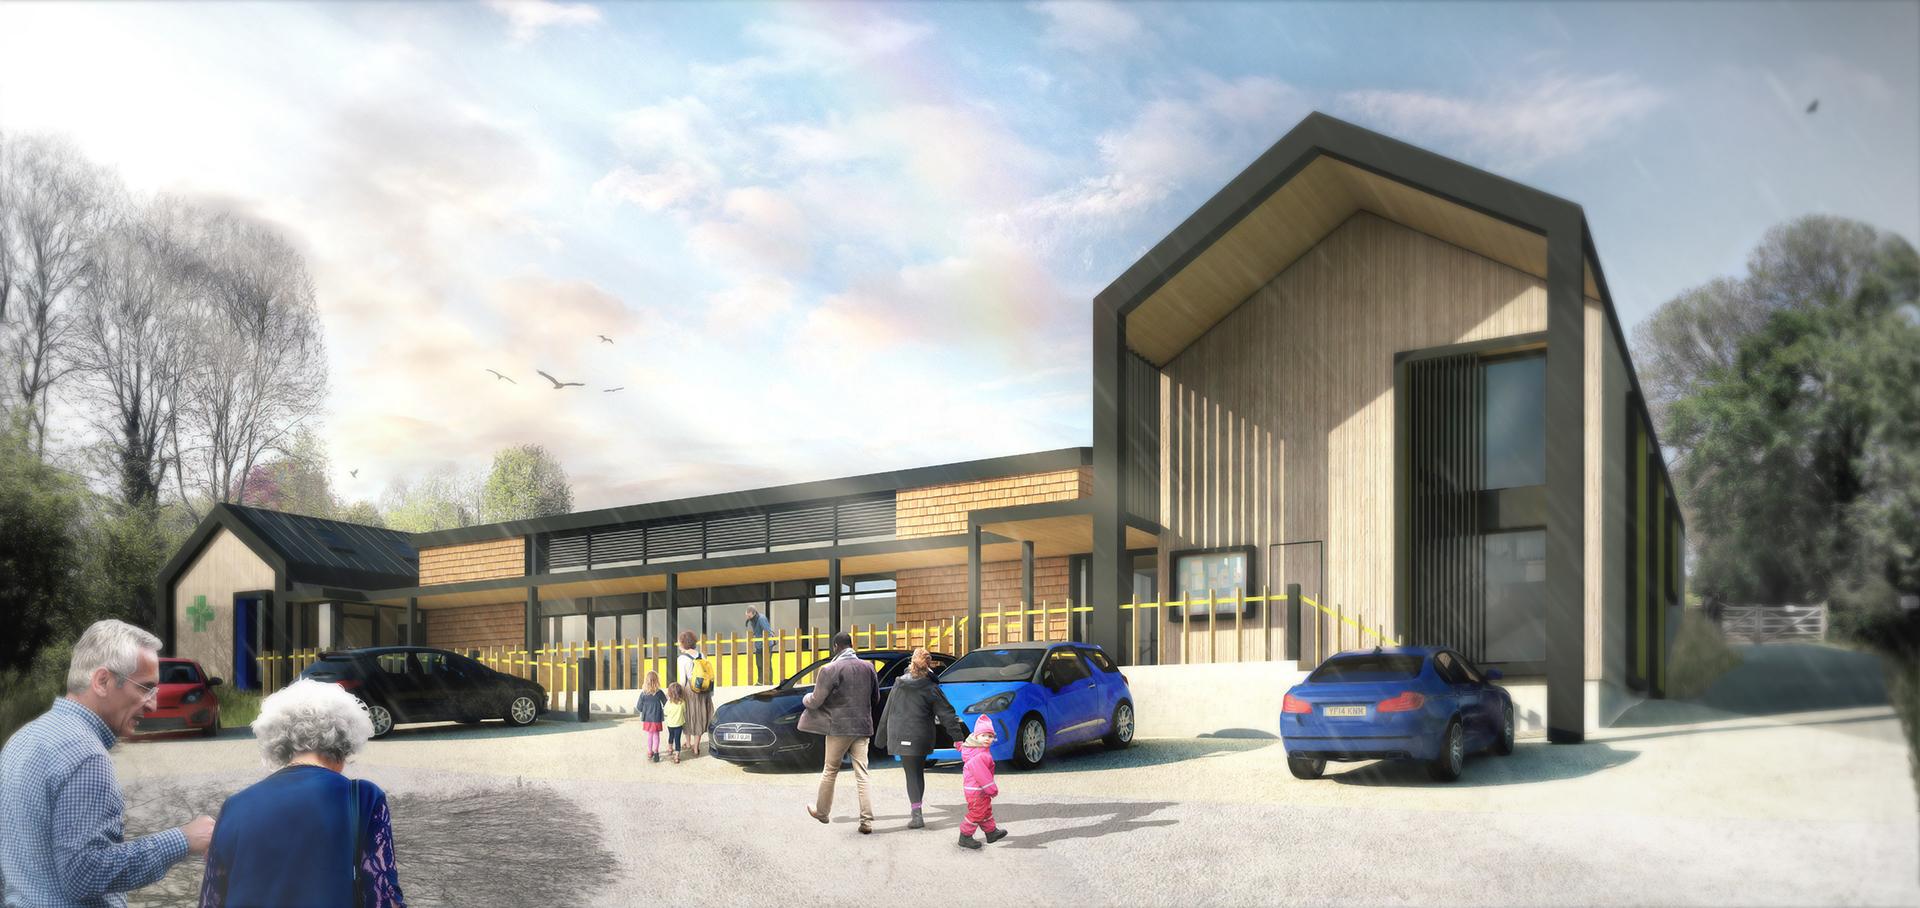 CRtB Order Neighbourhood Plan Limpley Stoke